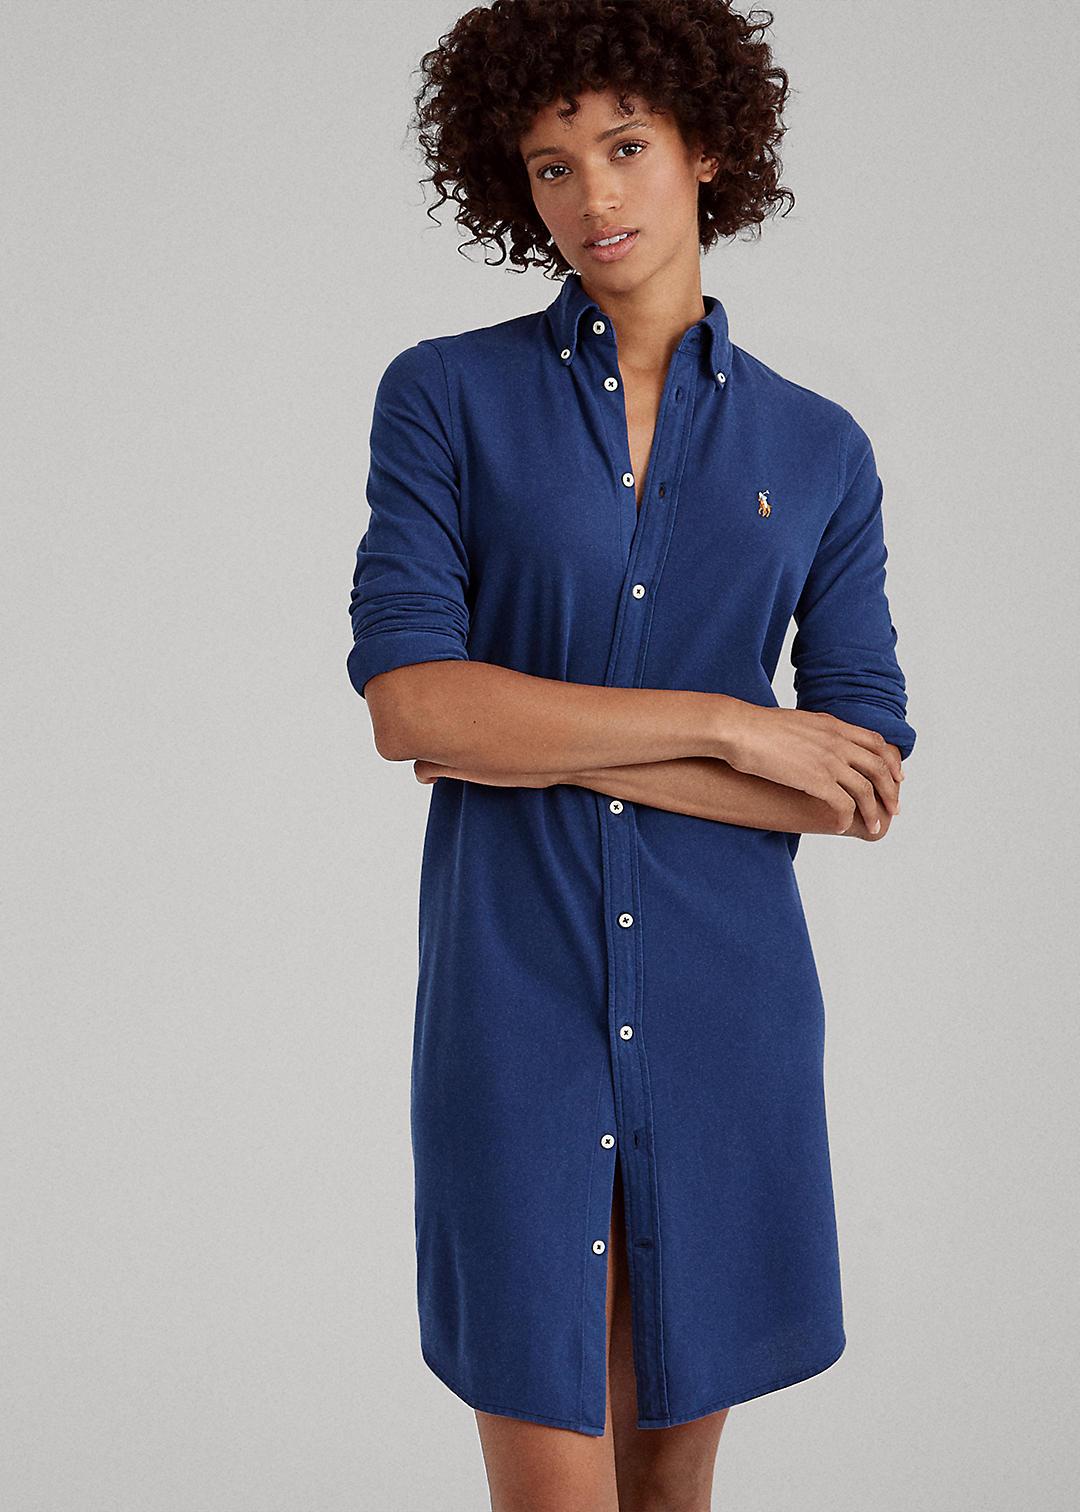 Knit Oxford Shirtdress